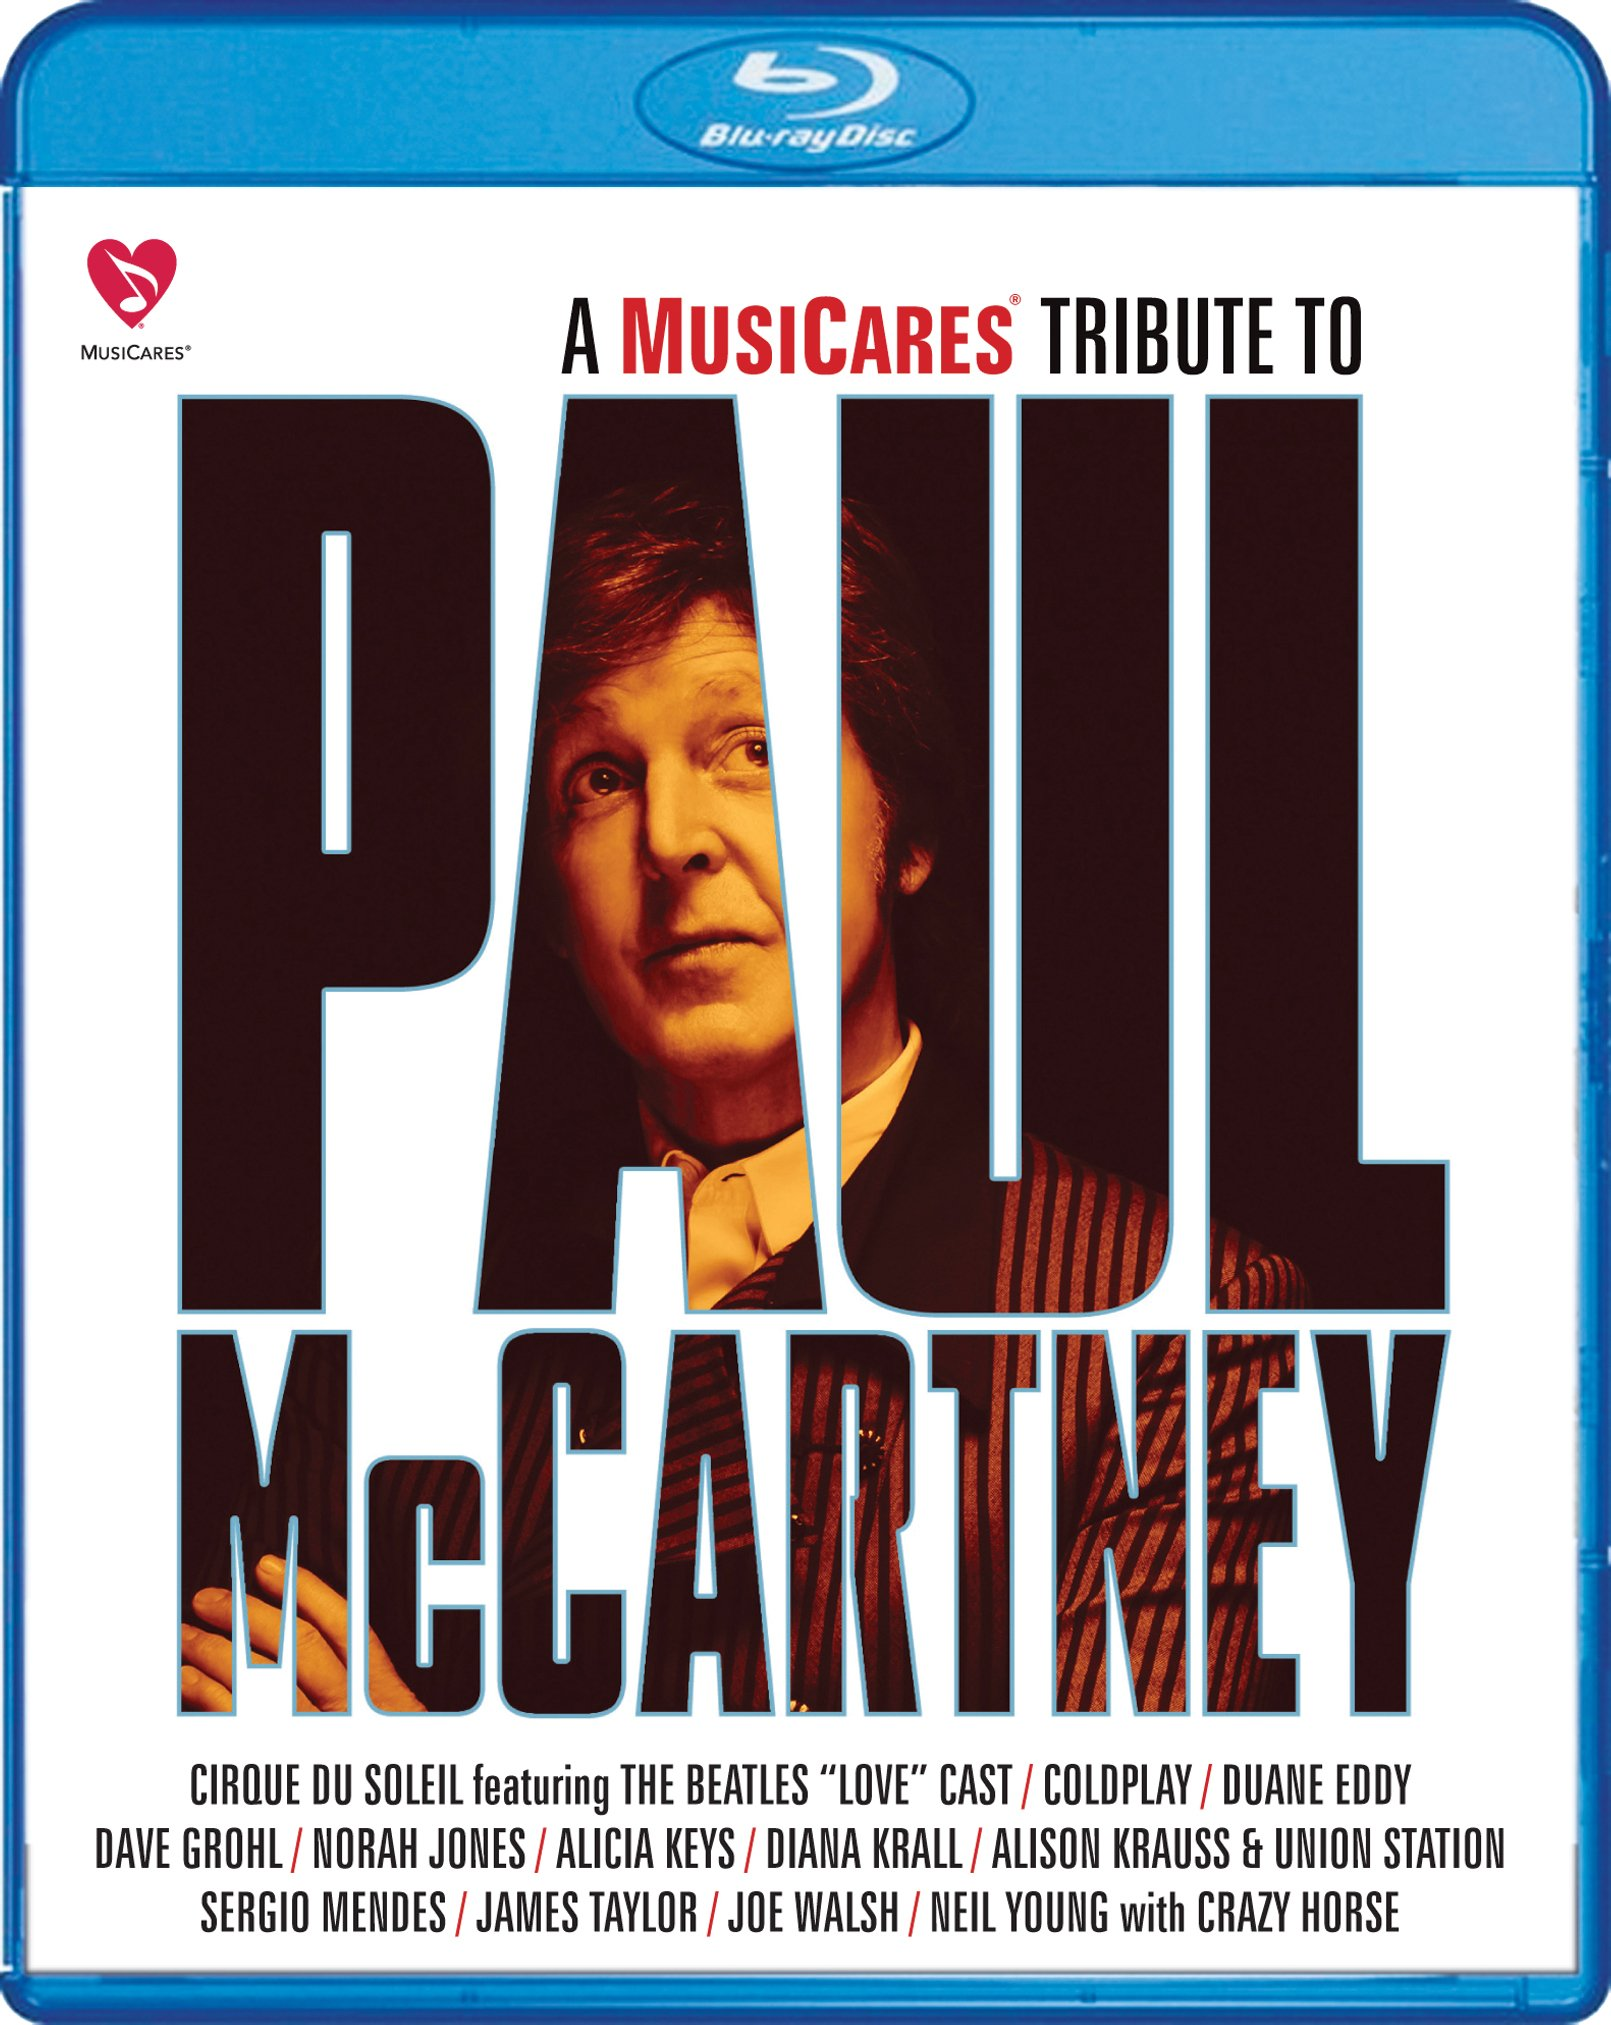 Blu-ray : Musicares Tribute to Paul McCartney (Blu-ray)